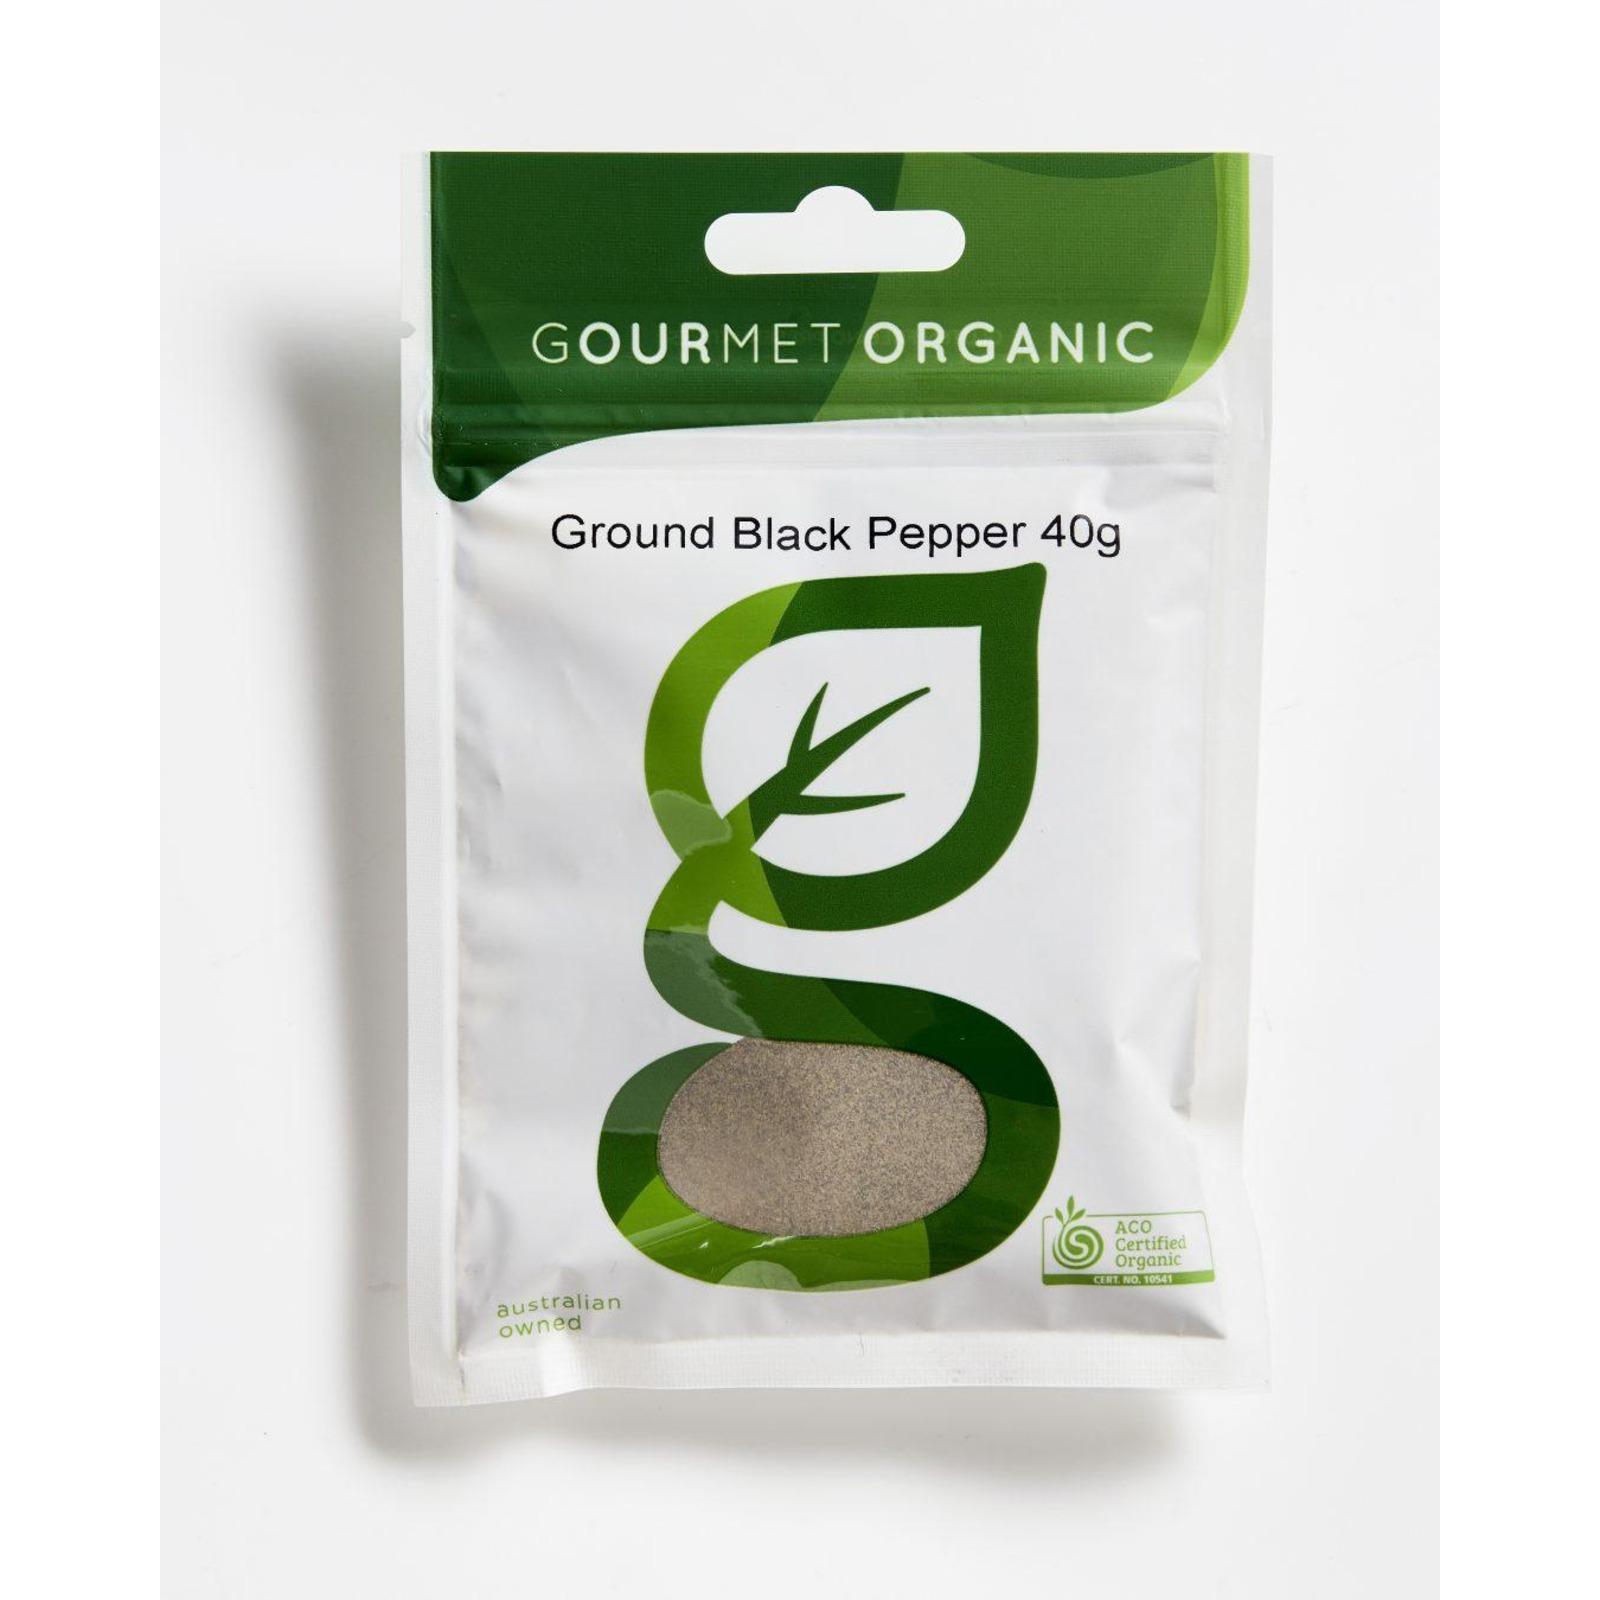 Gourmet Organic Pepper Black Ground